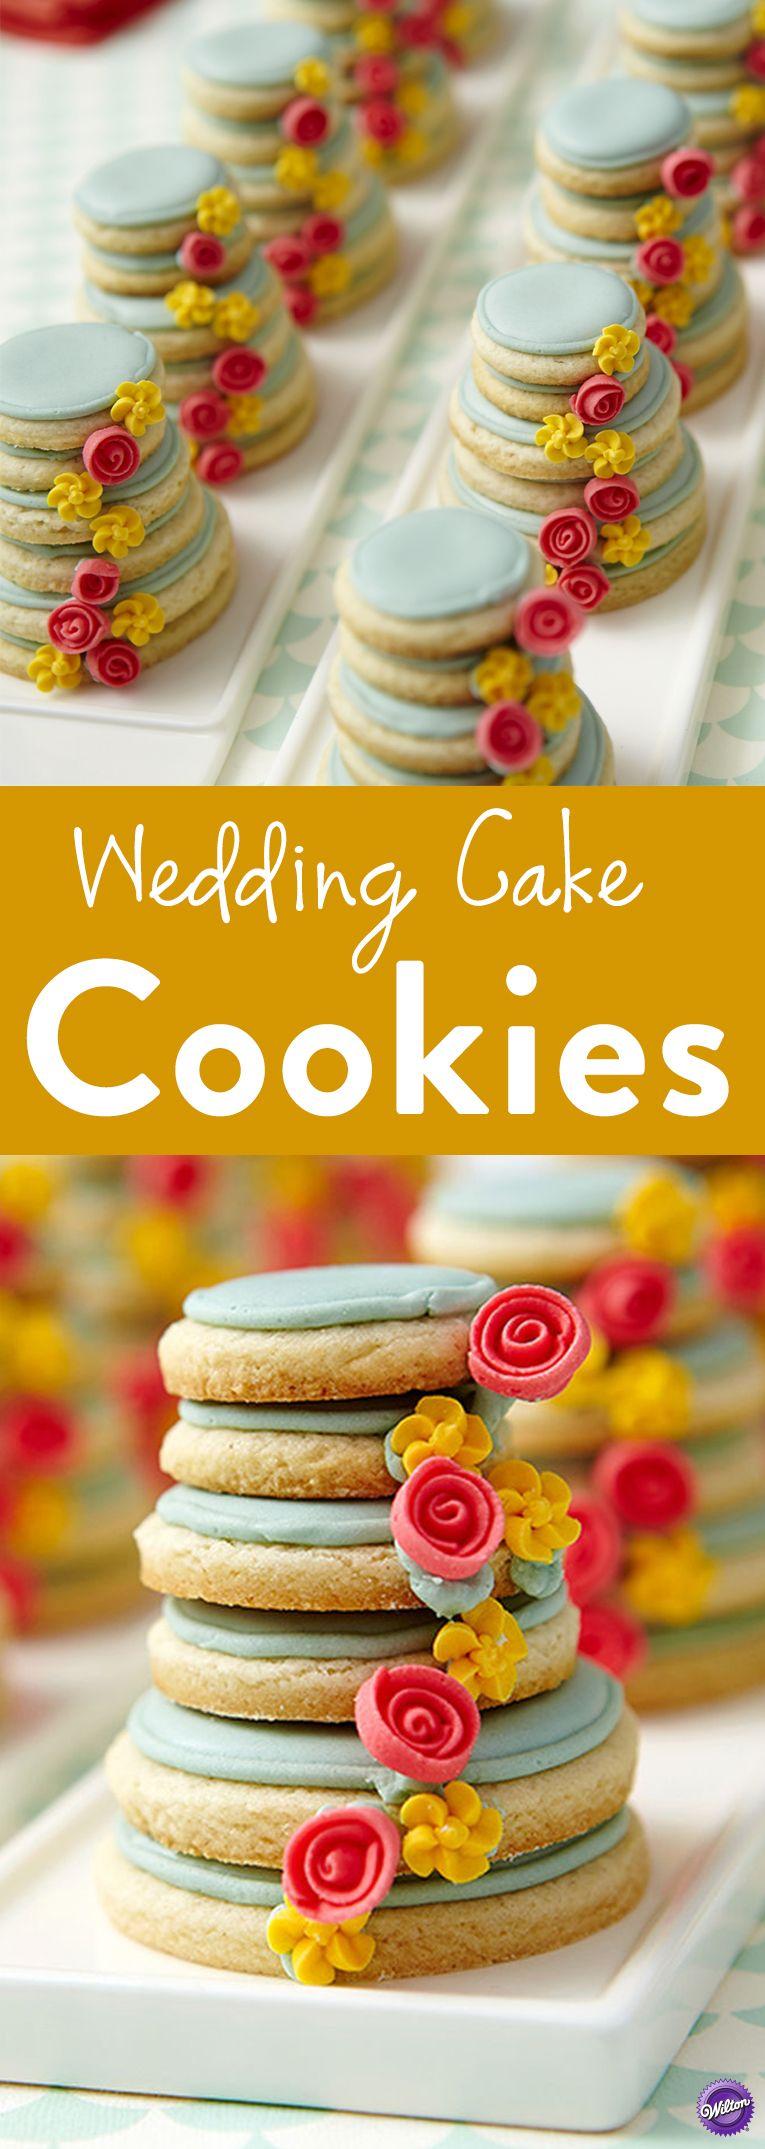 Wedding Cake Cookies | Wedding Cakes and Desserts | Pinterest ...